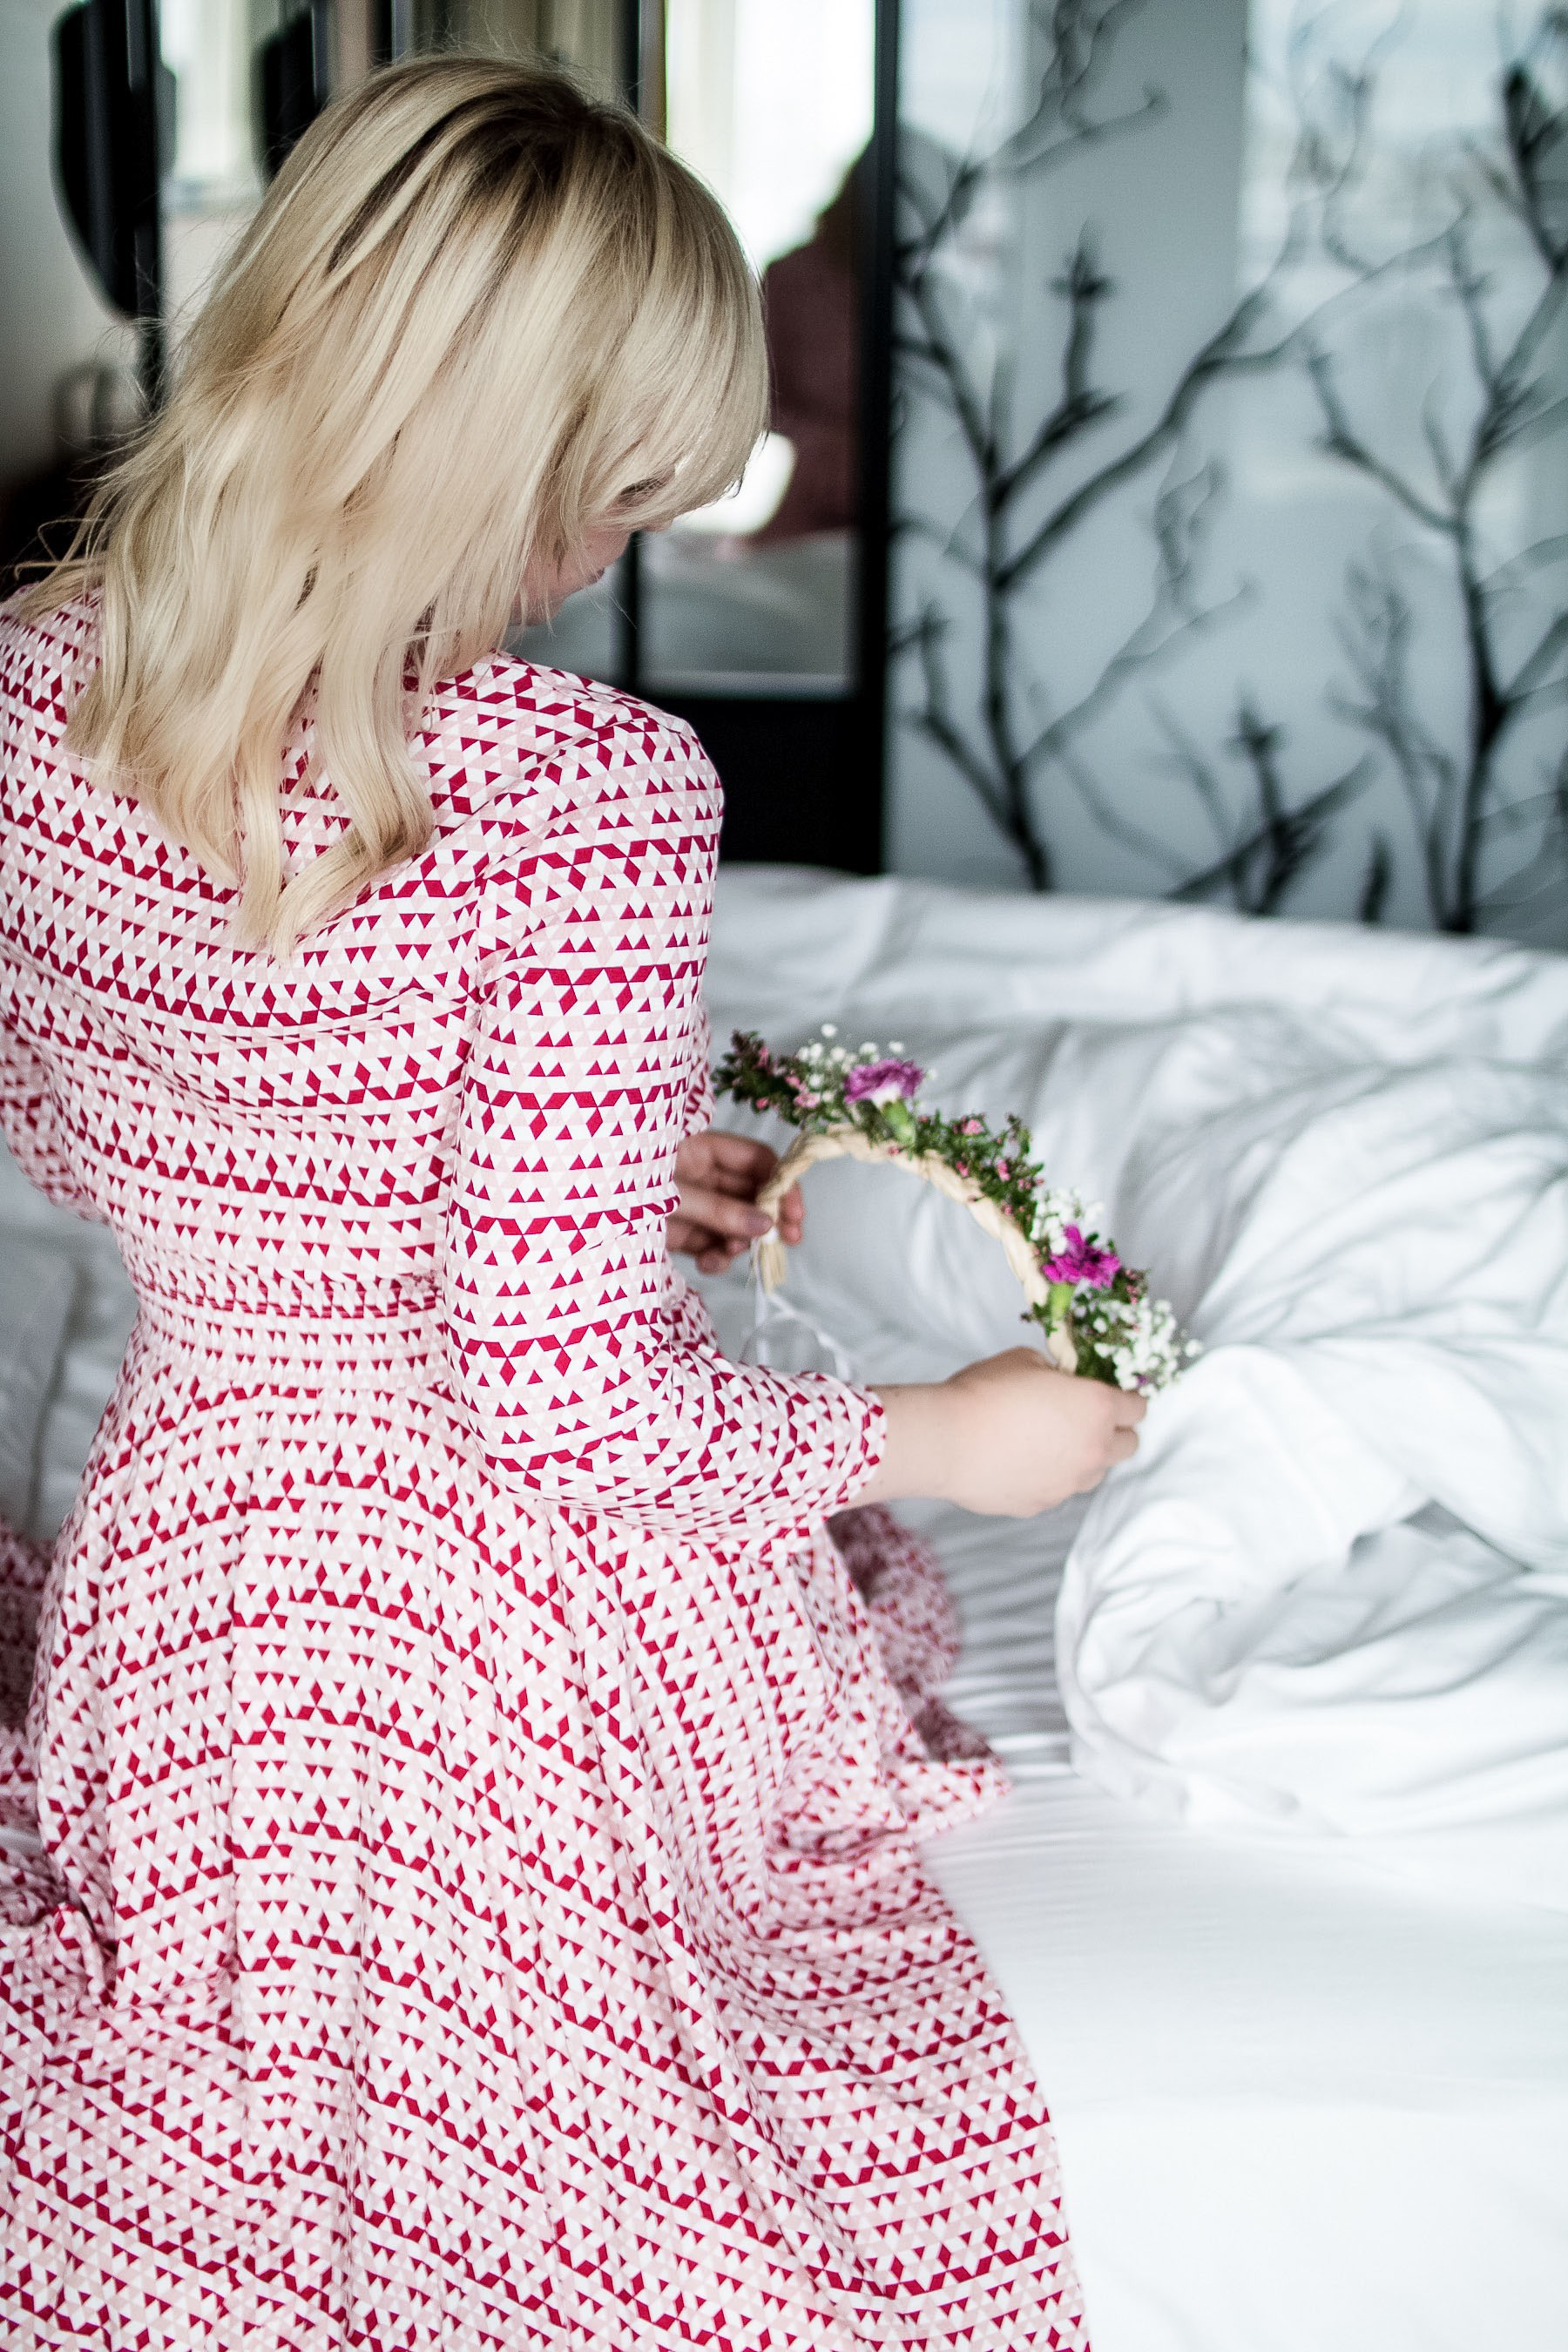 Maje_Fashionblogger_Summerdress_Inspiration_modeblogger